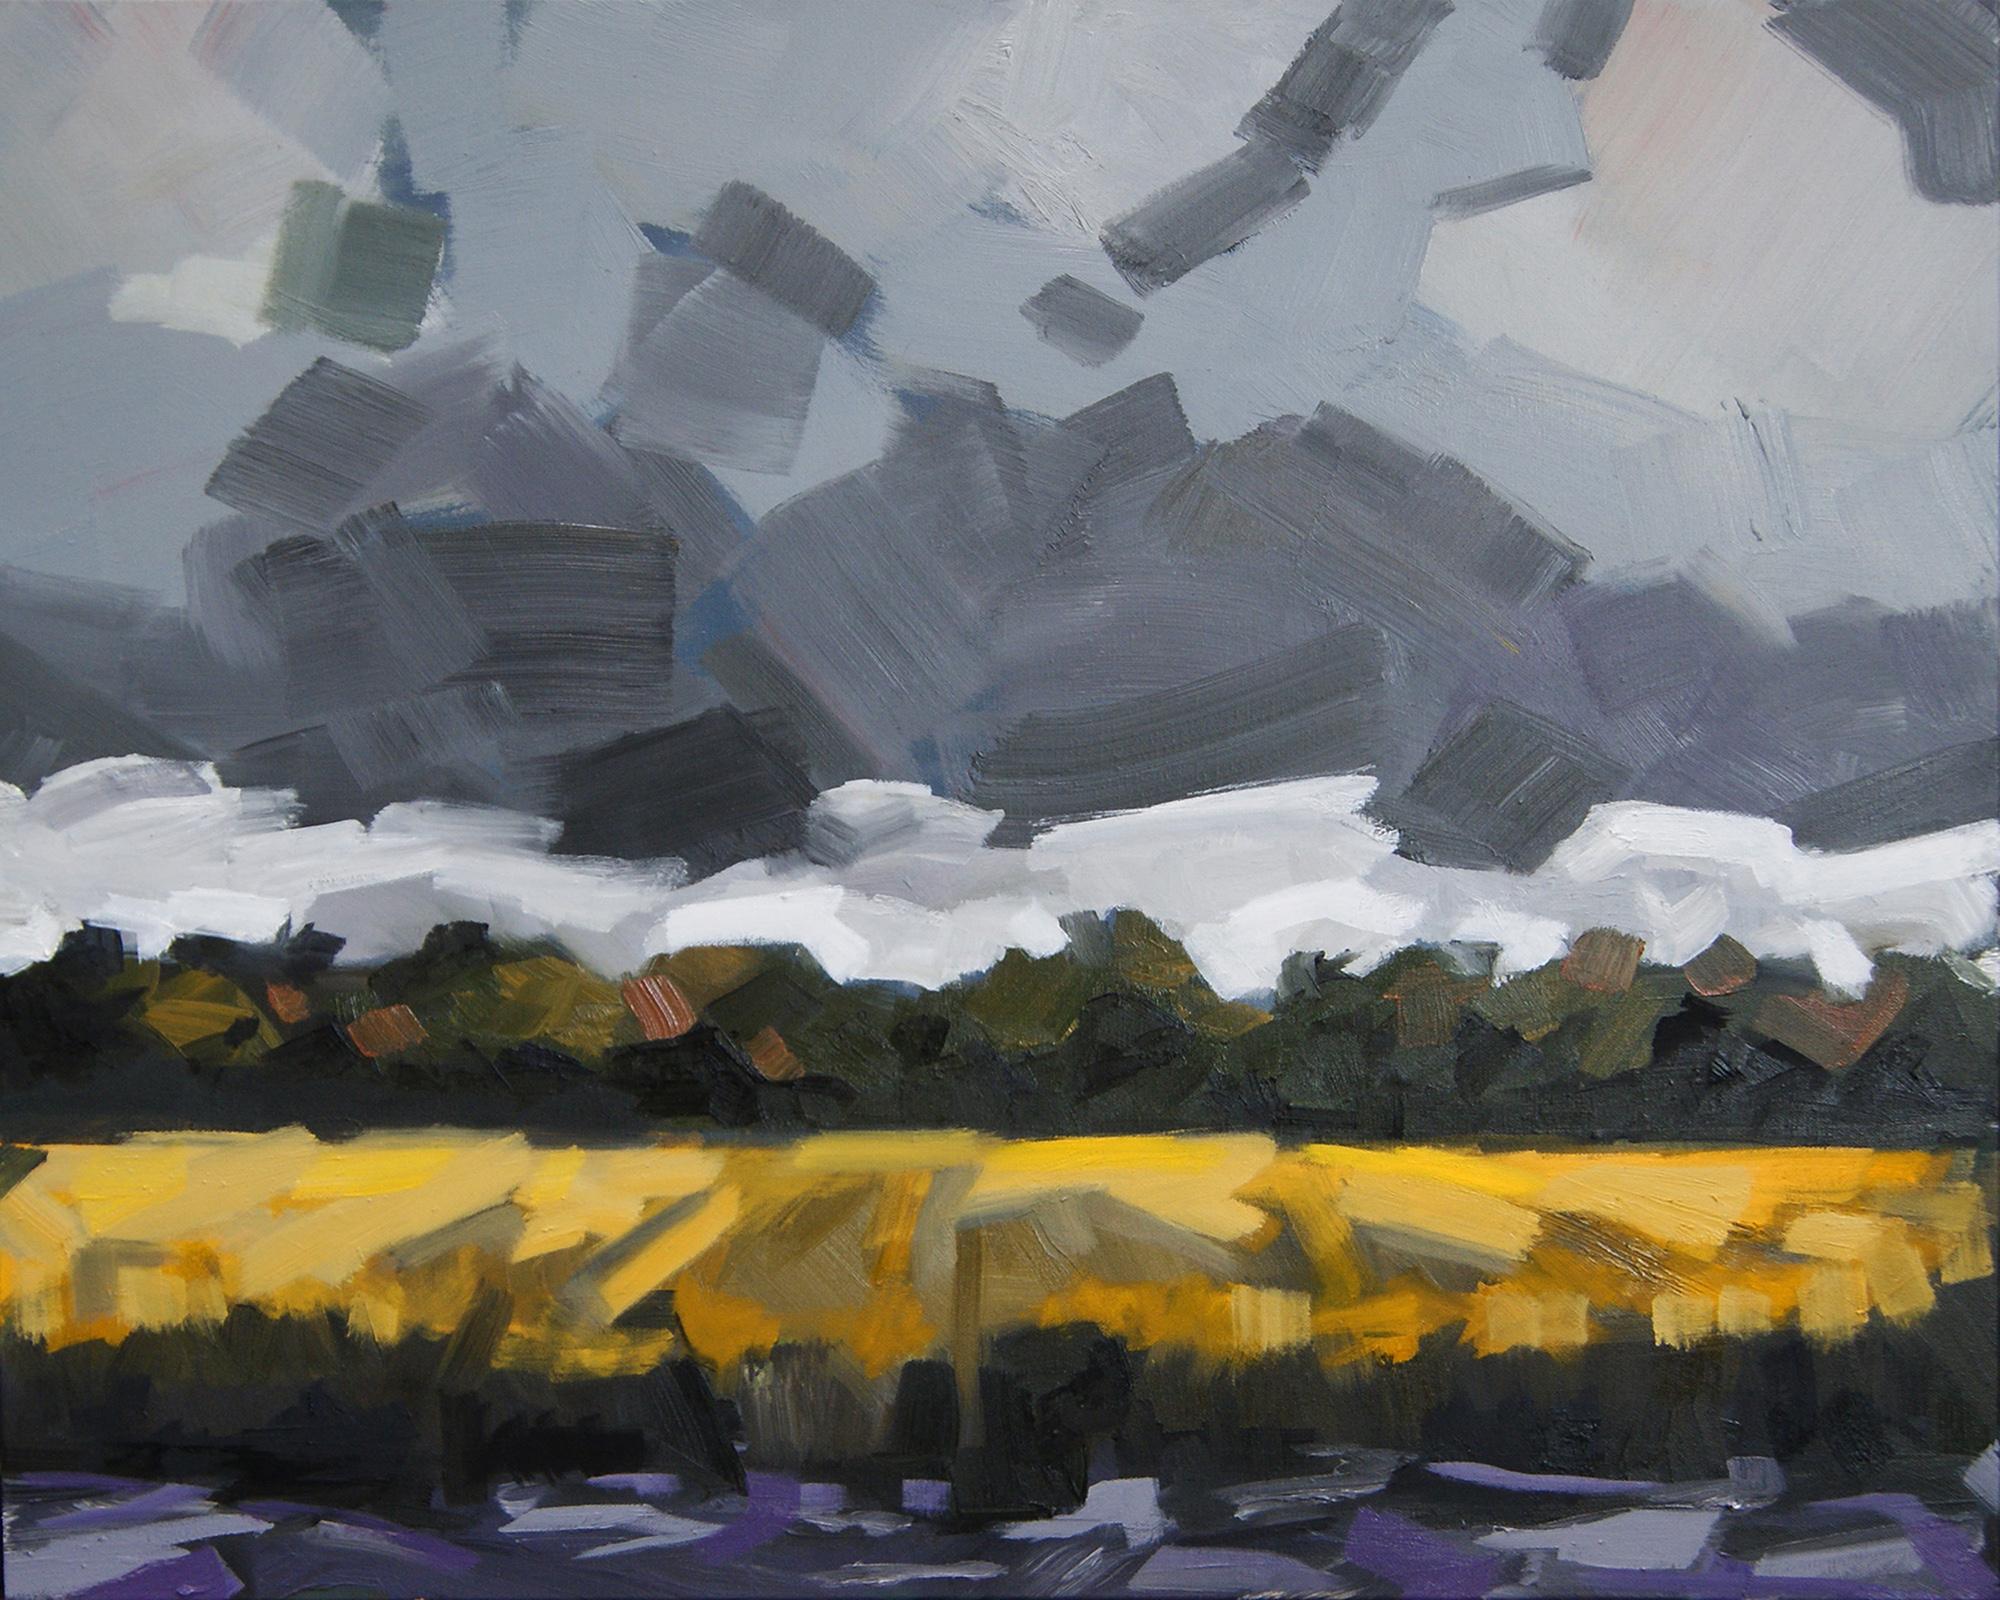 WheatFieldandRain. 24x30_.oil on canvas.jpg